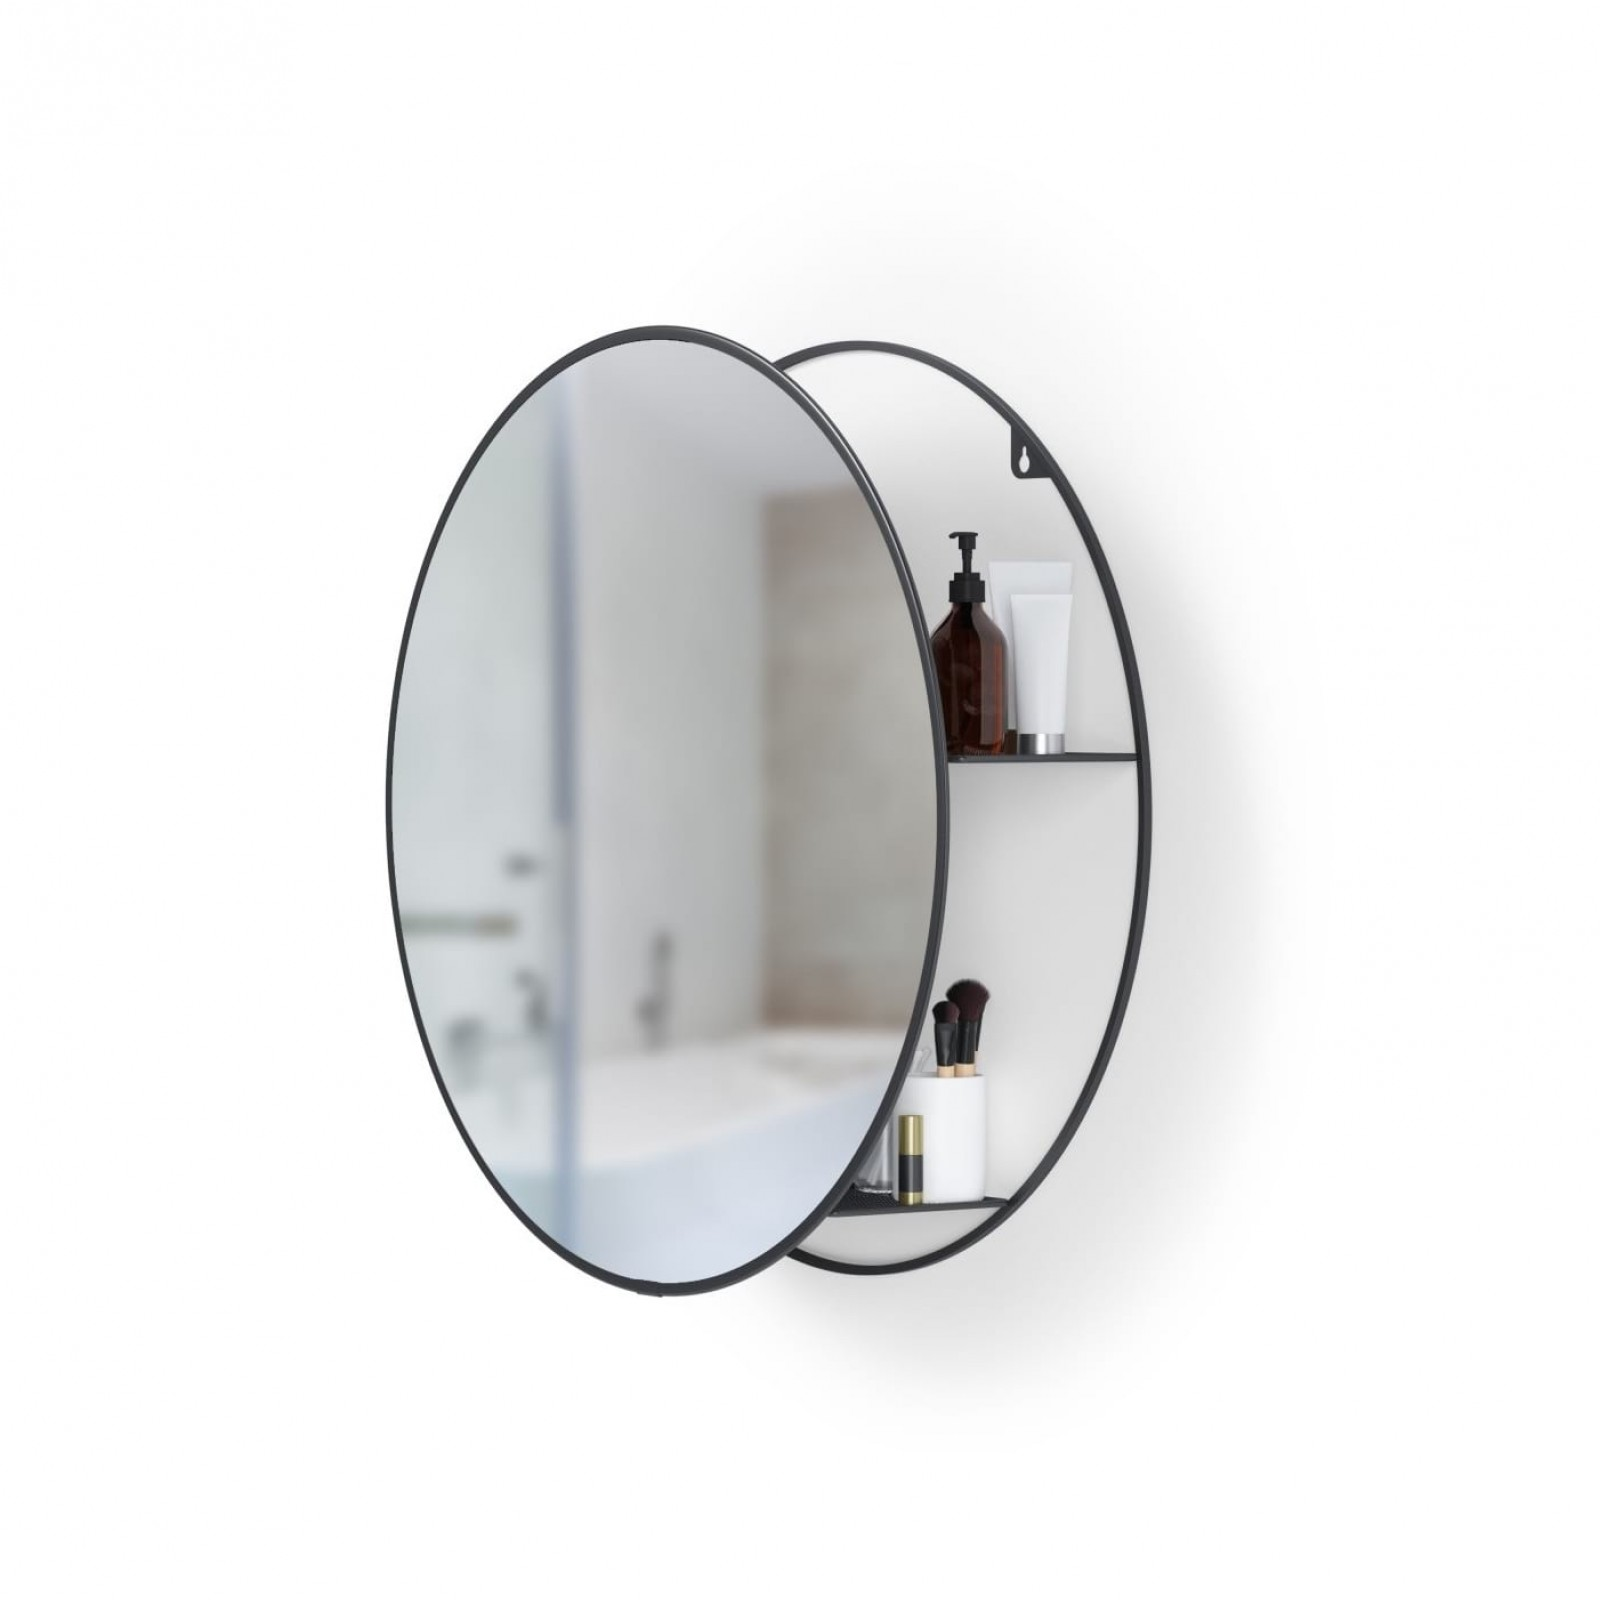 Cirko Wall Mirror and Storage Unit (Black) - Umbra